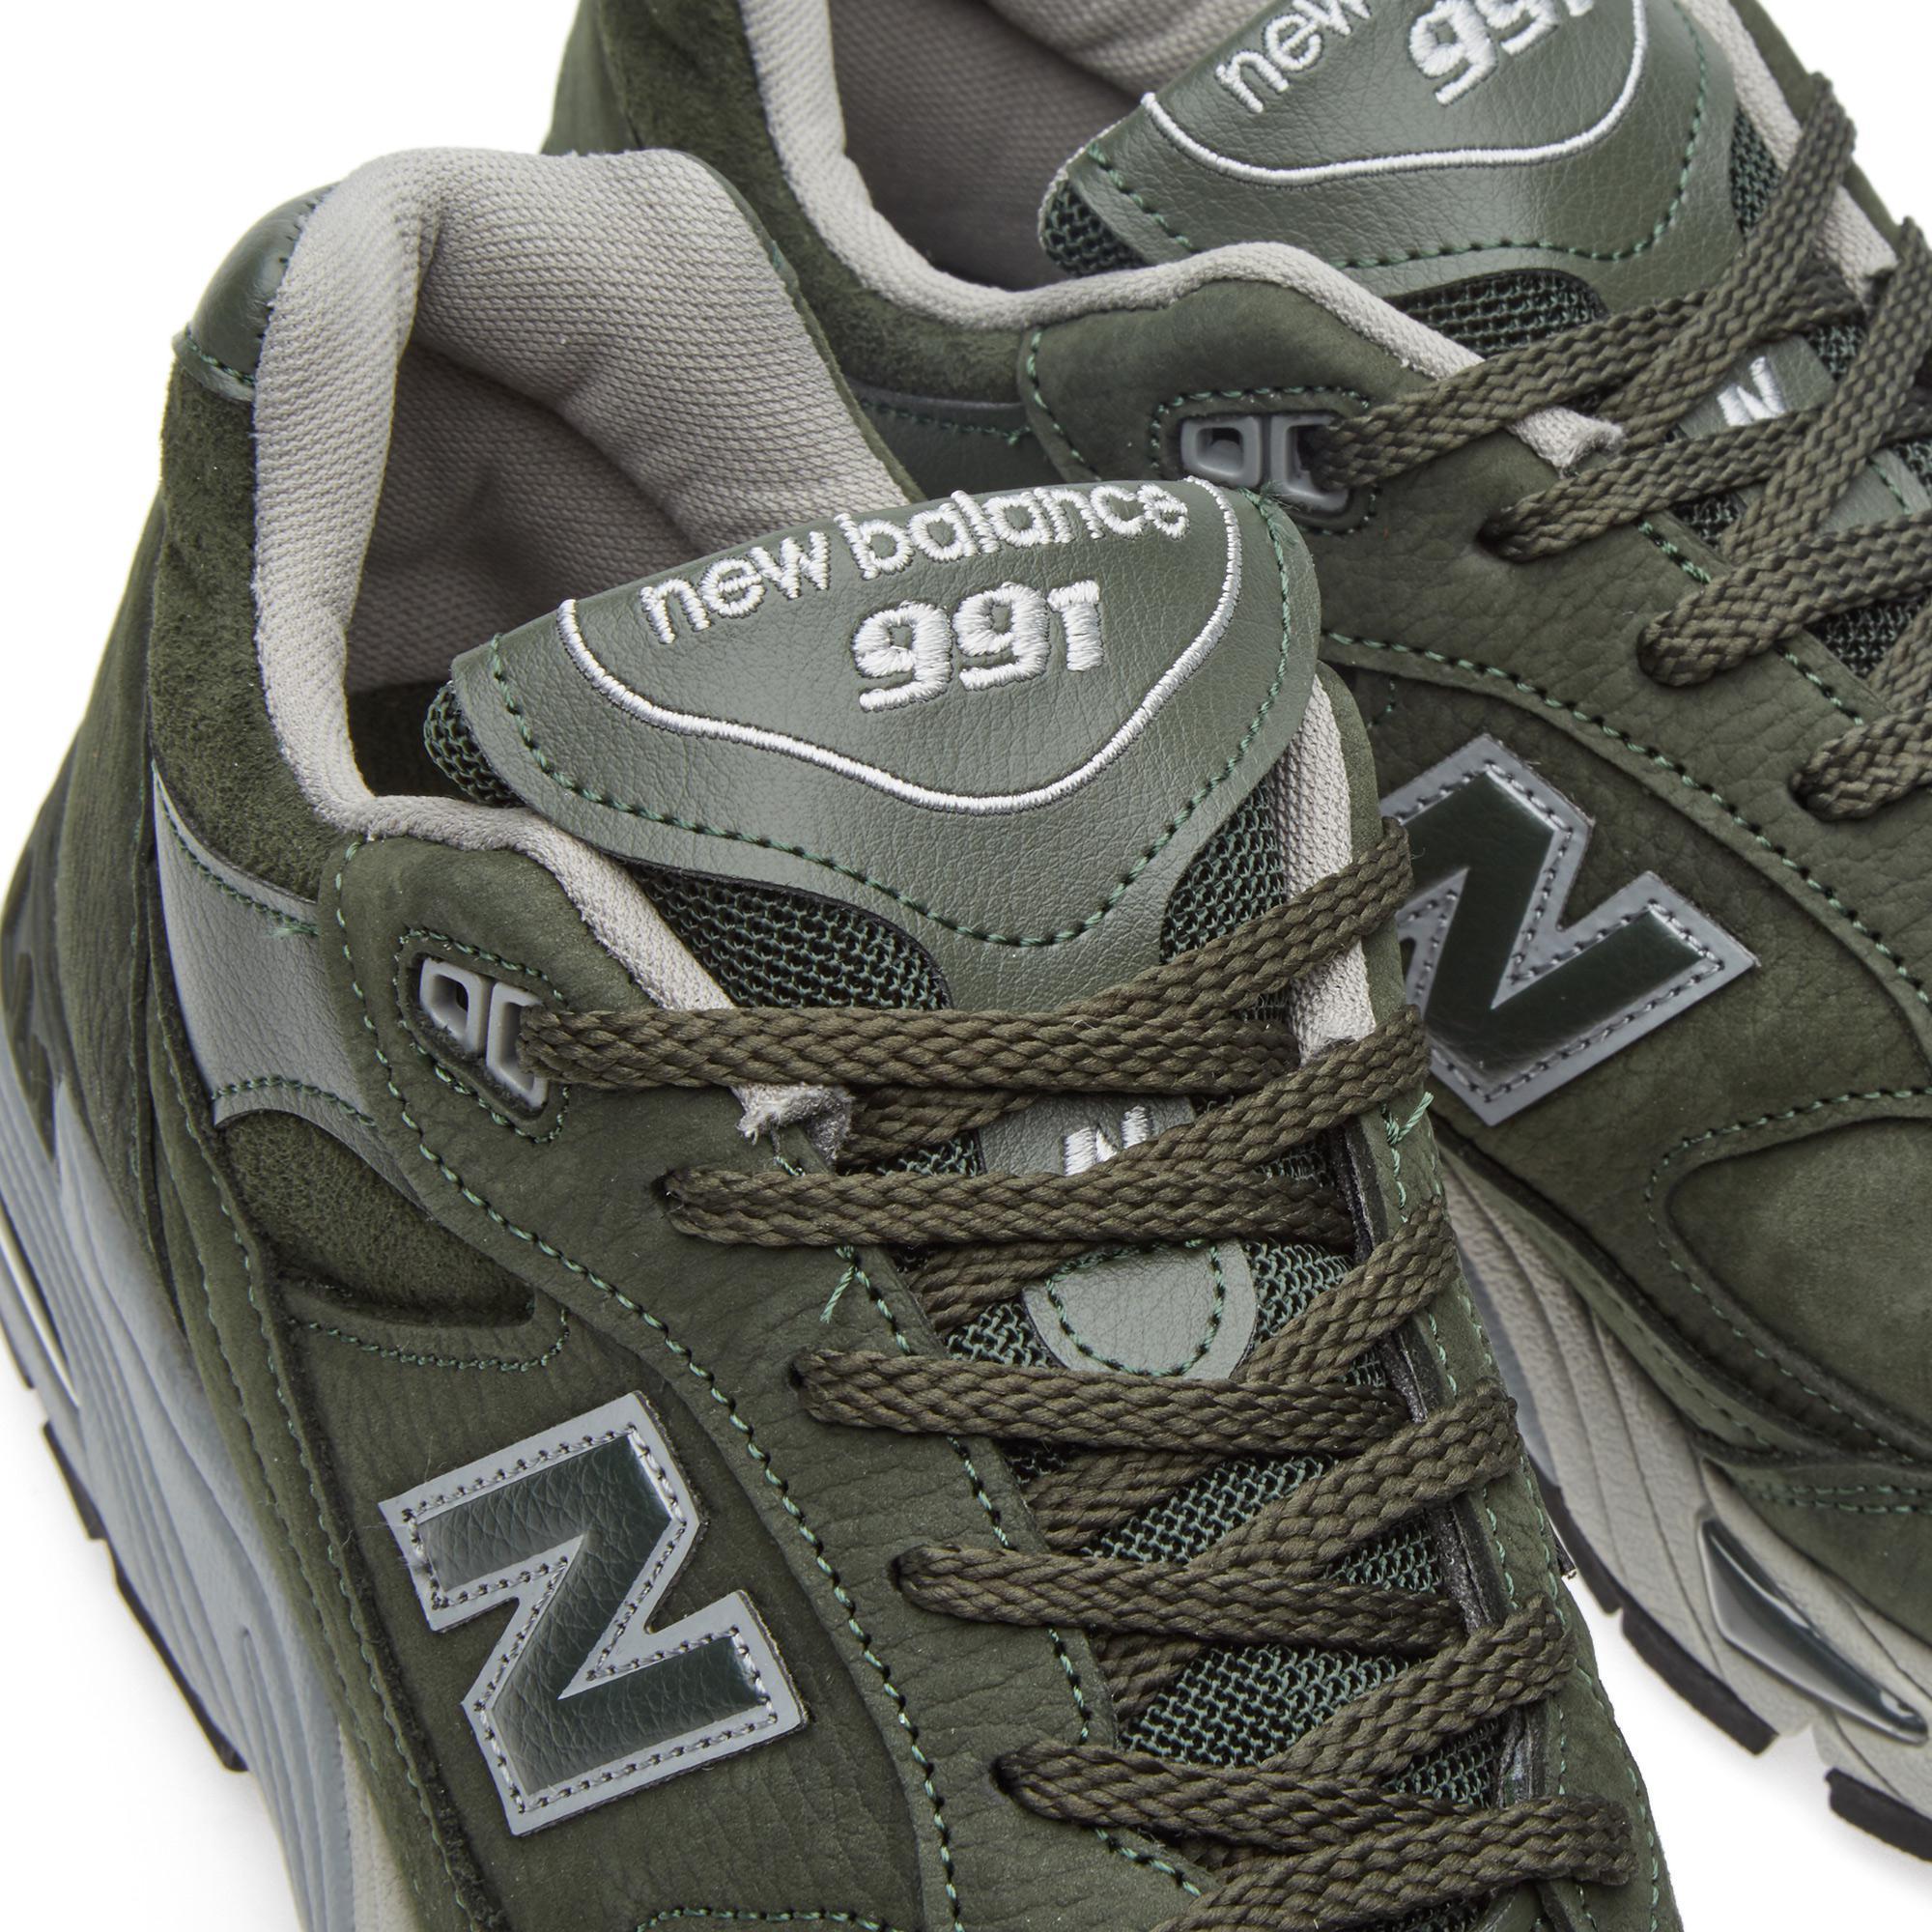 new balance 991 sdg